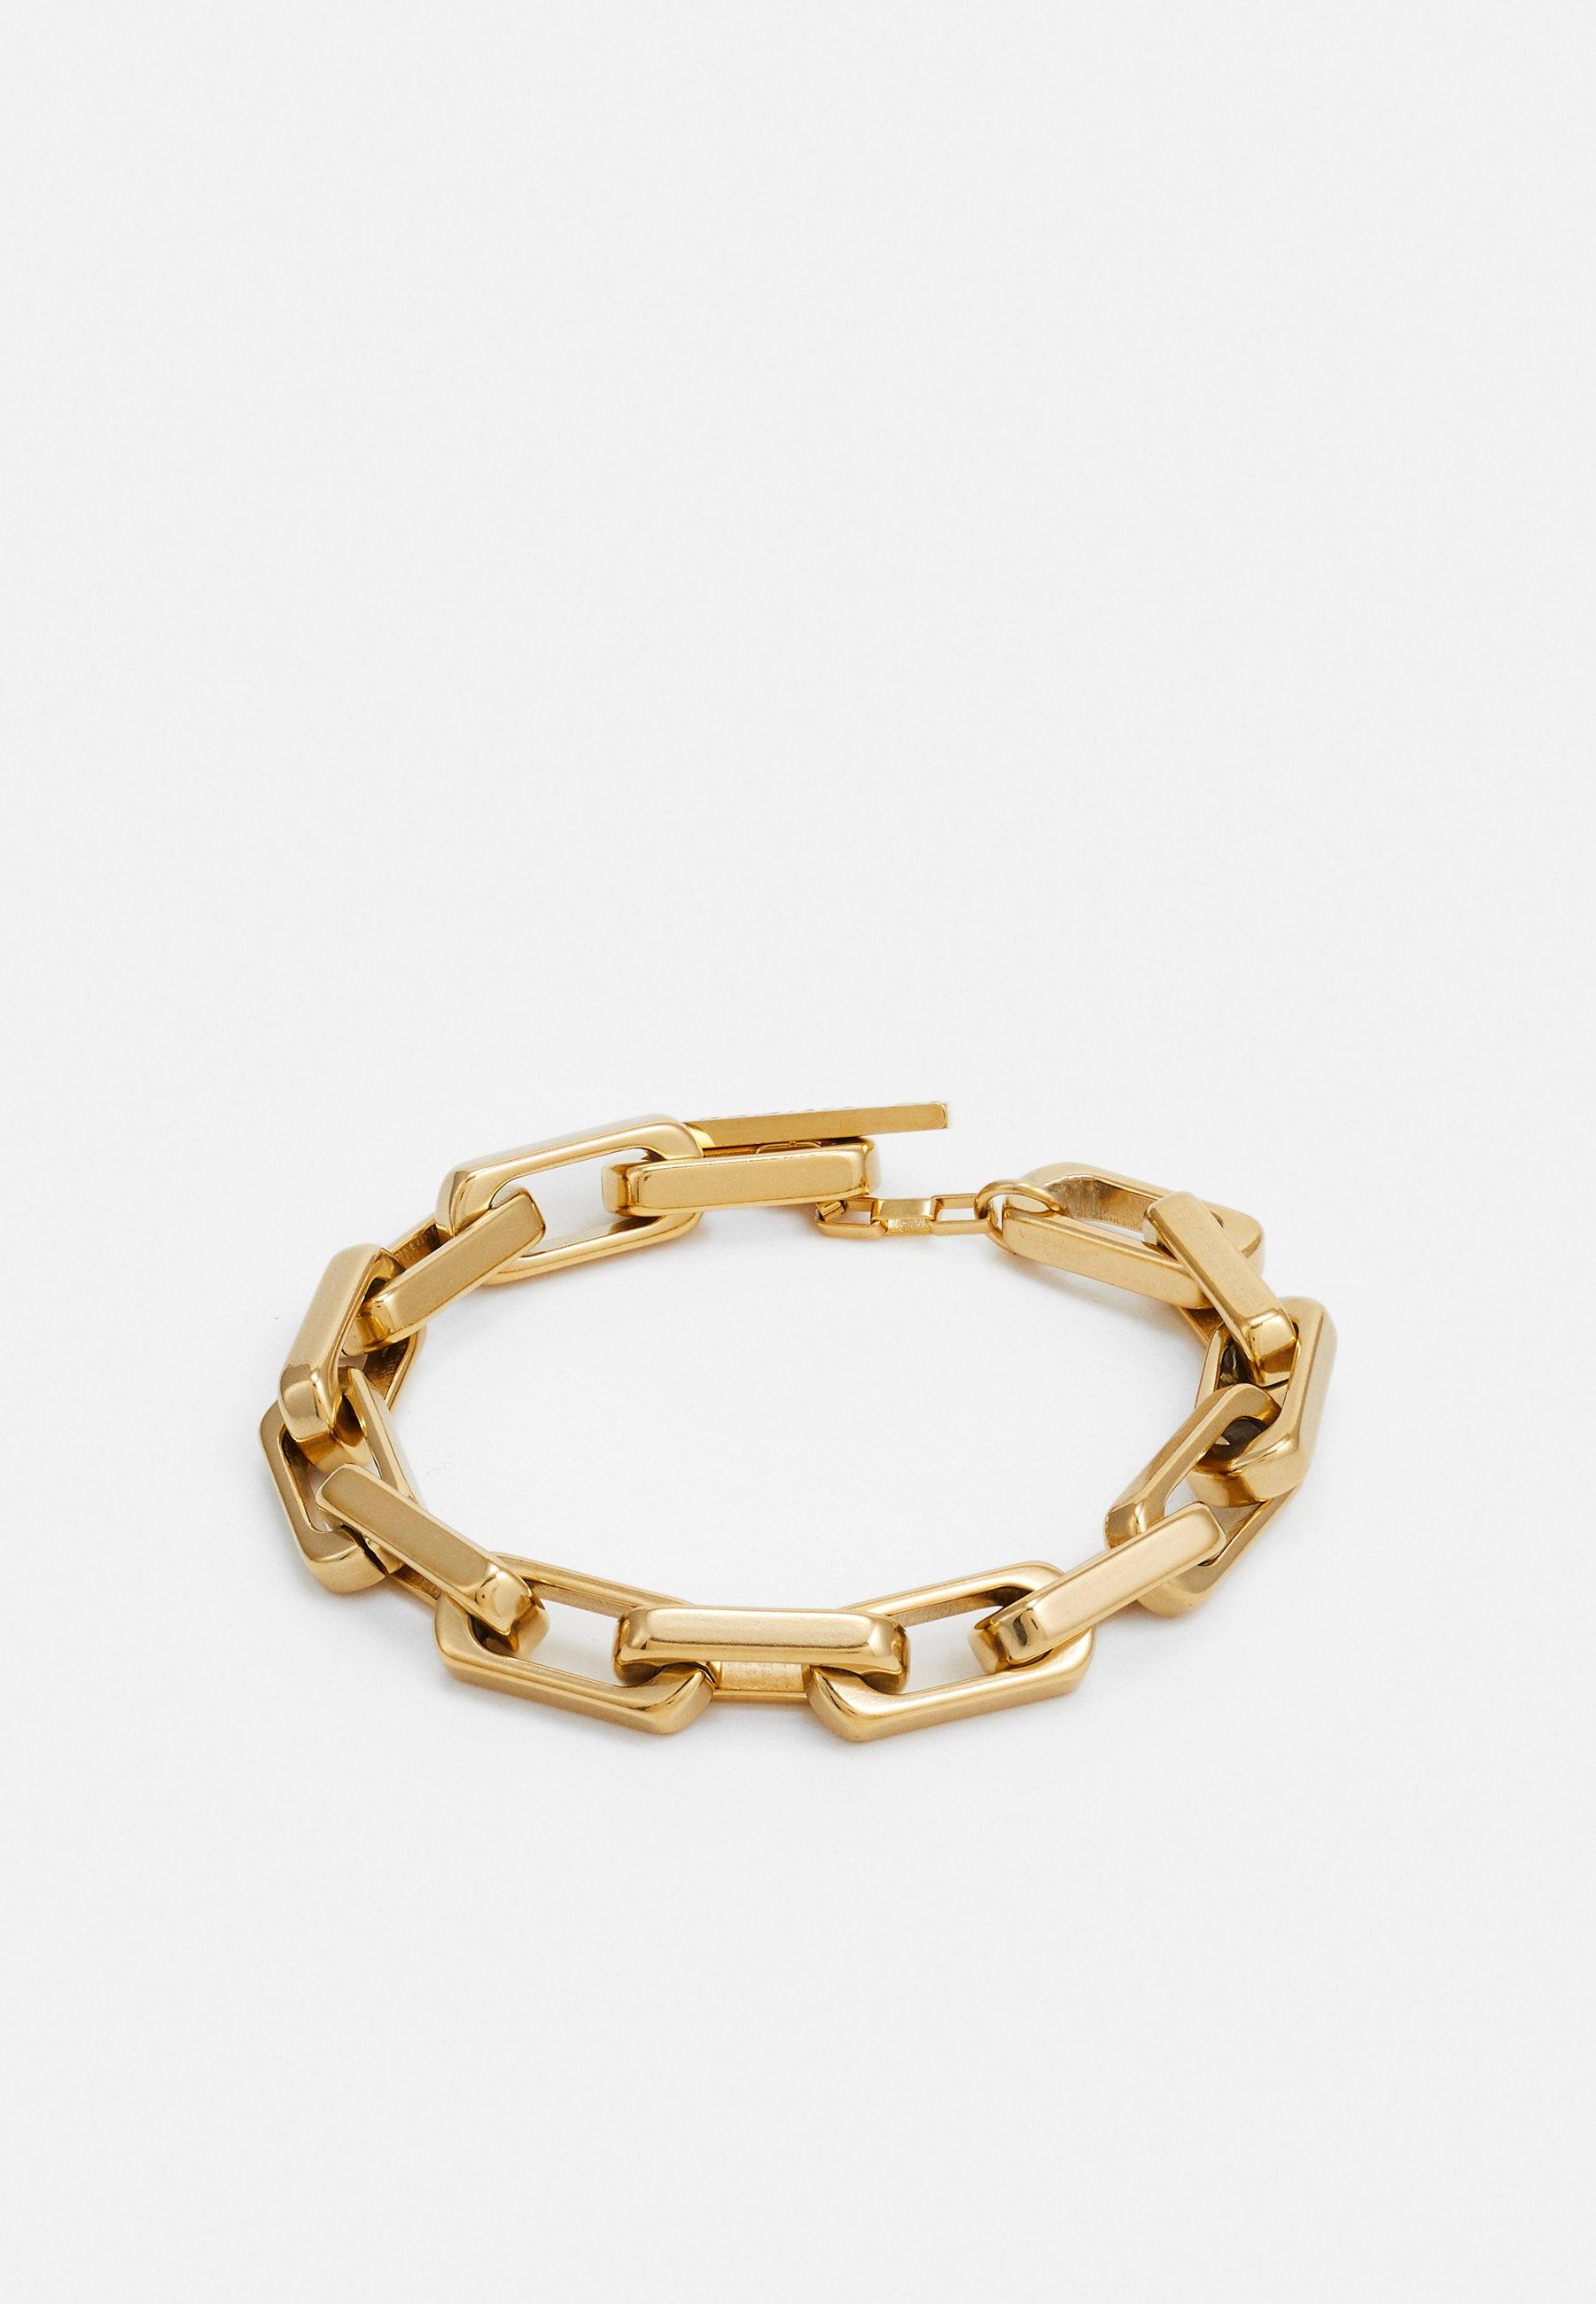 Femme URBAN LEGEND T BAR LOGO BOLD CHAIN UNISEX - Bracelet